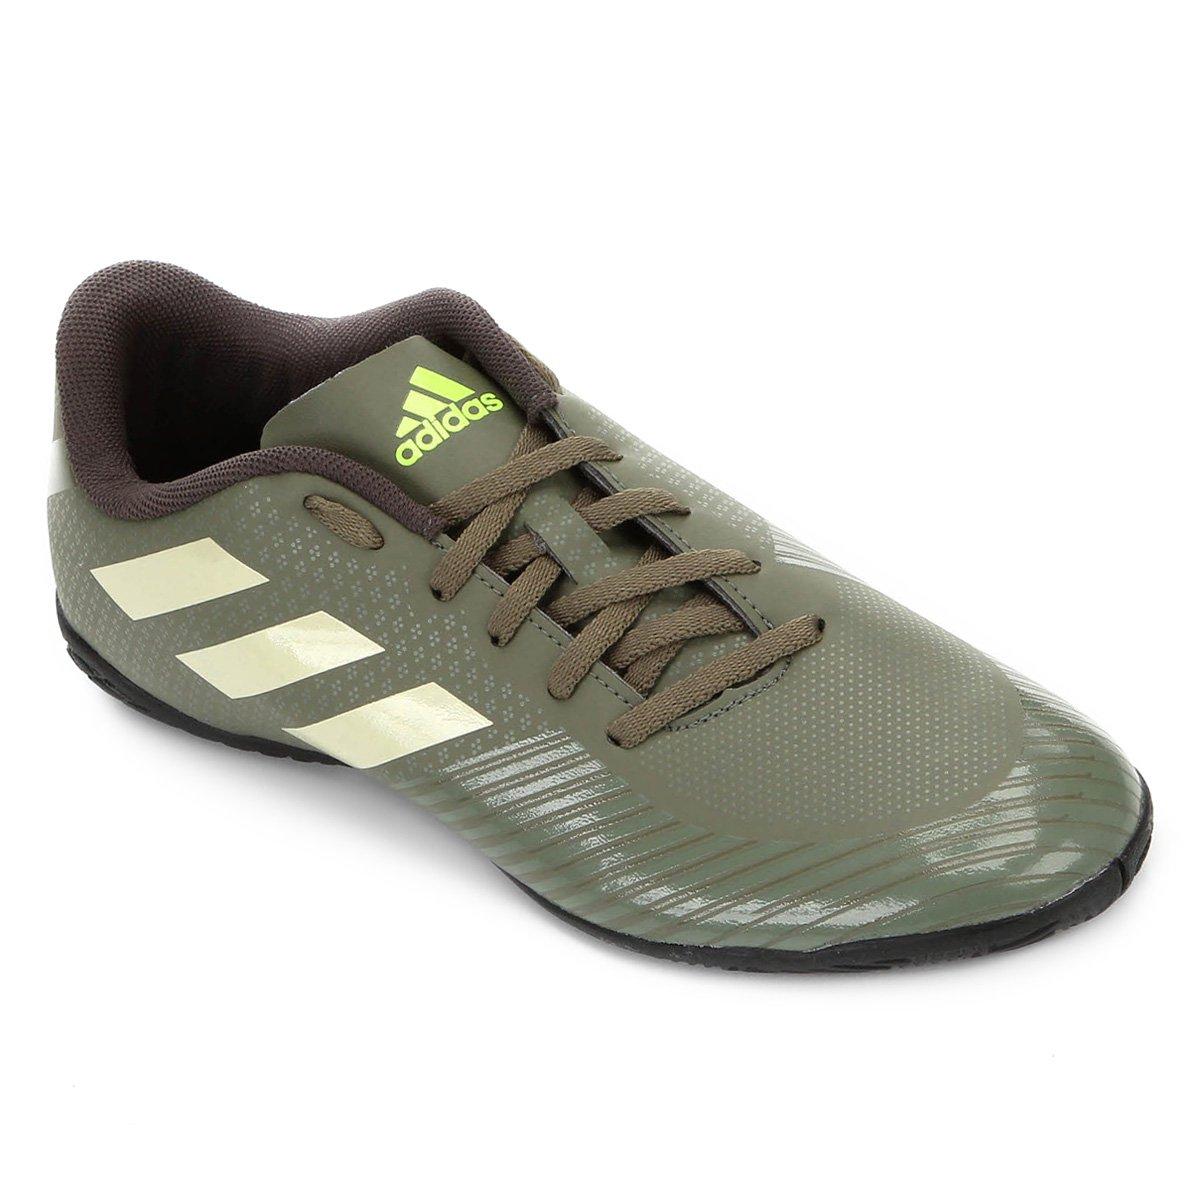 Chuteira Futsal Adidas Artilheira III IN - Verde e Preto